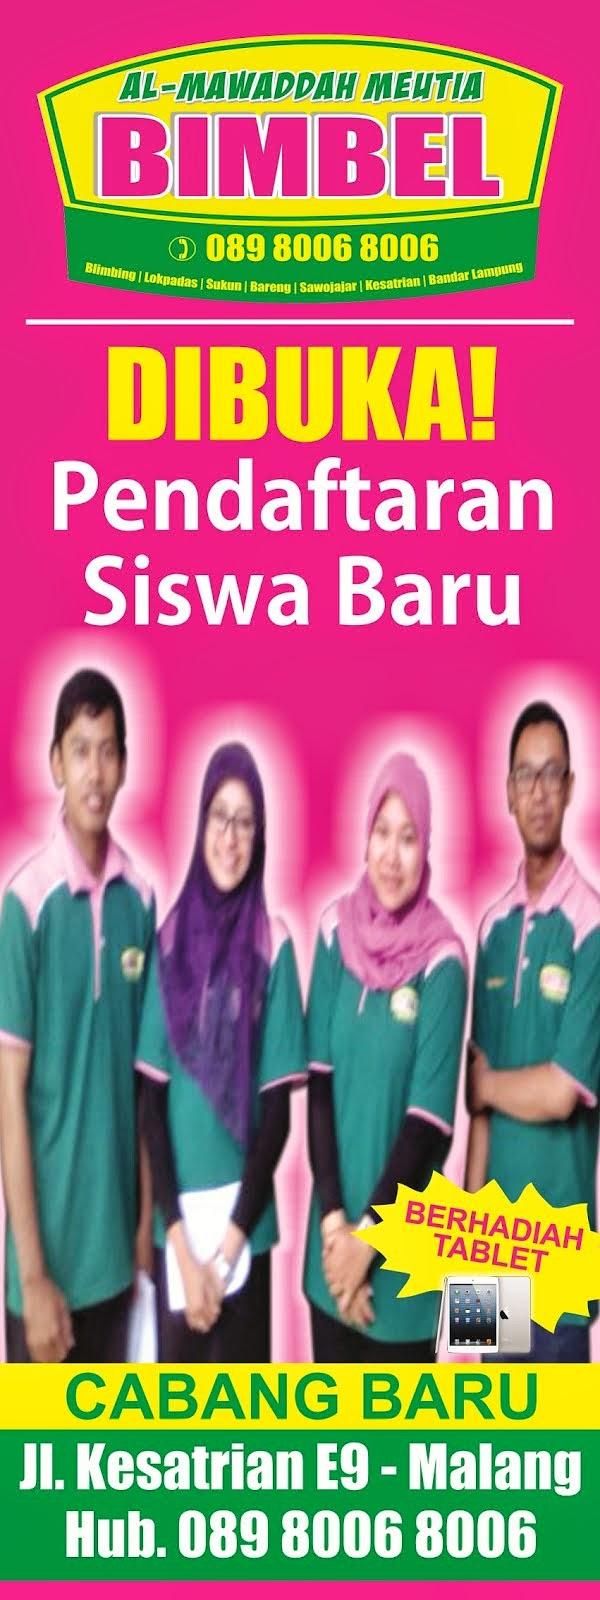 BIMBEL INDONESIA OFFICIAL